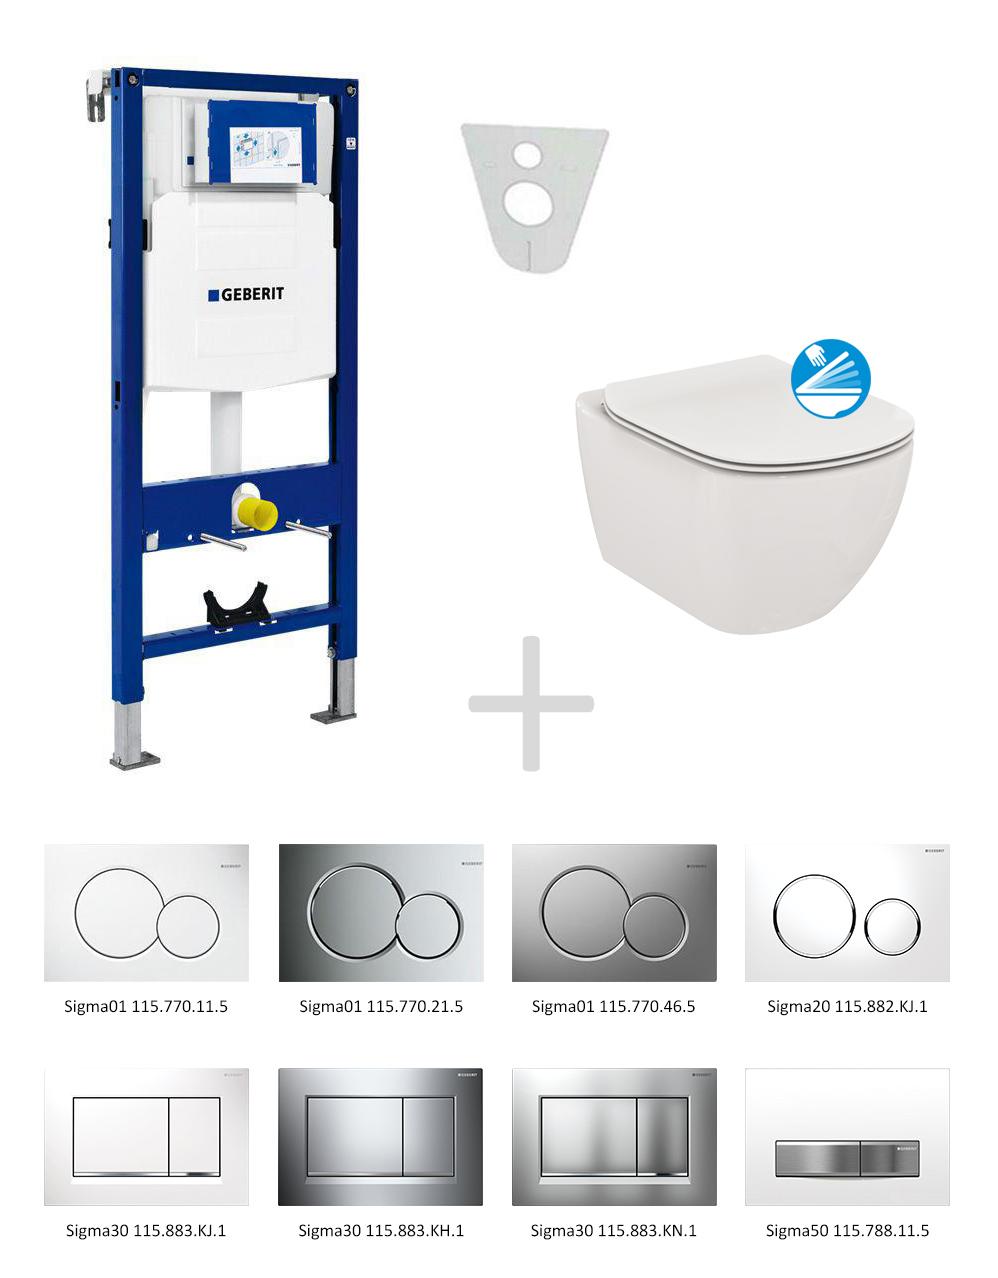 Geberit Duofix Sada pro závěsné WC 111.300.00.5 NE + klozet a sedátko Ideal Standard Tesi - sada s tlačítkem Sigma01, bílé 111.300.00.5 NE1